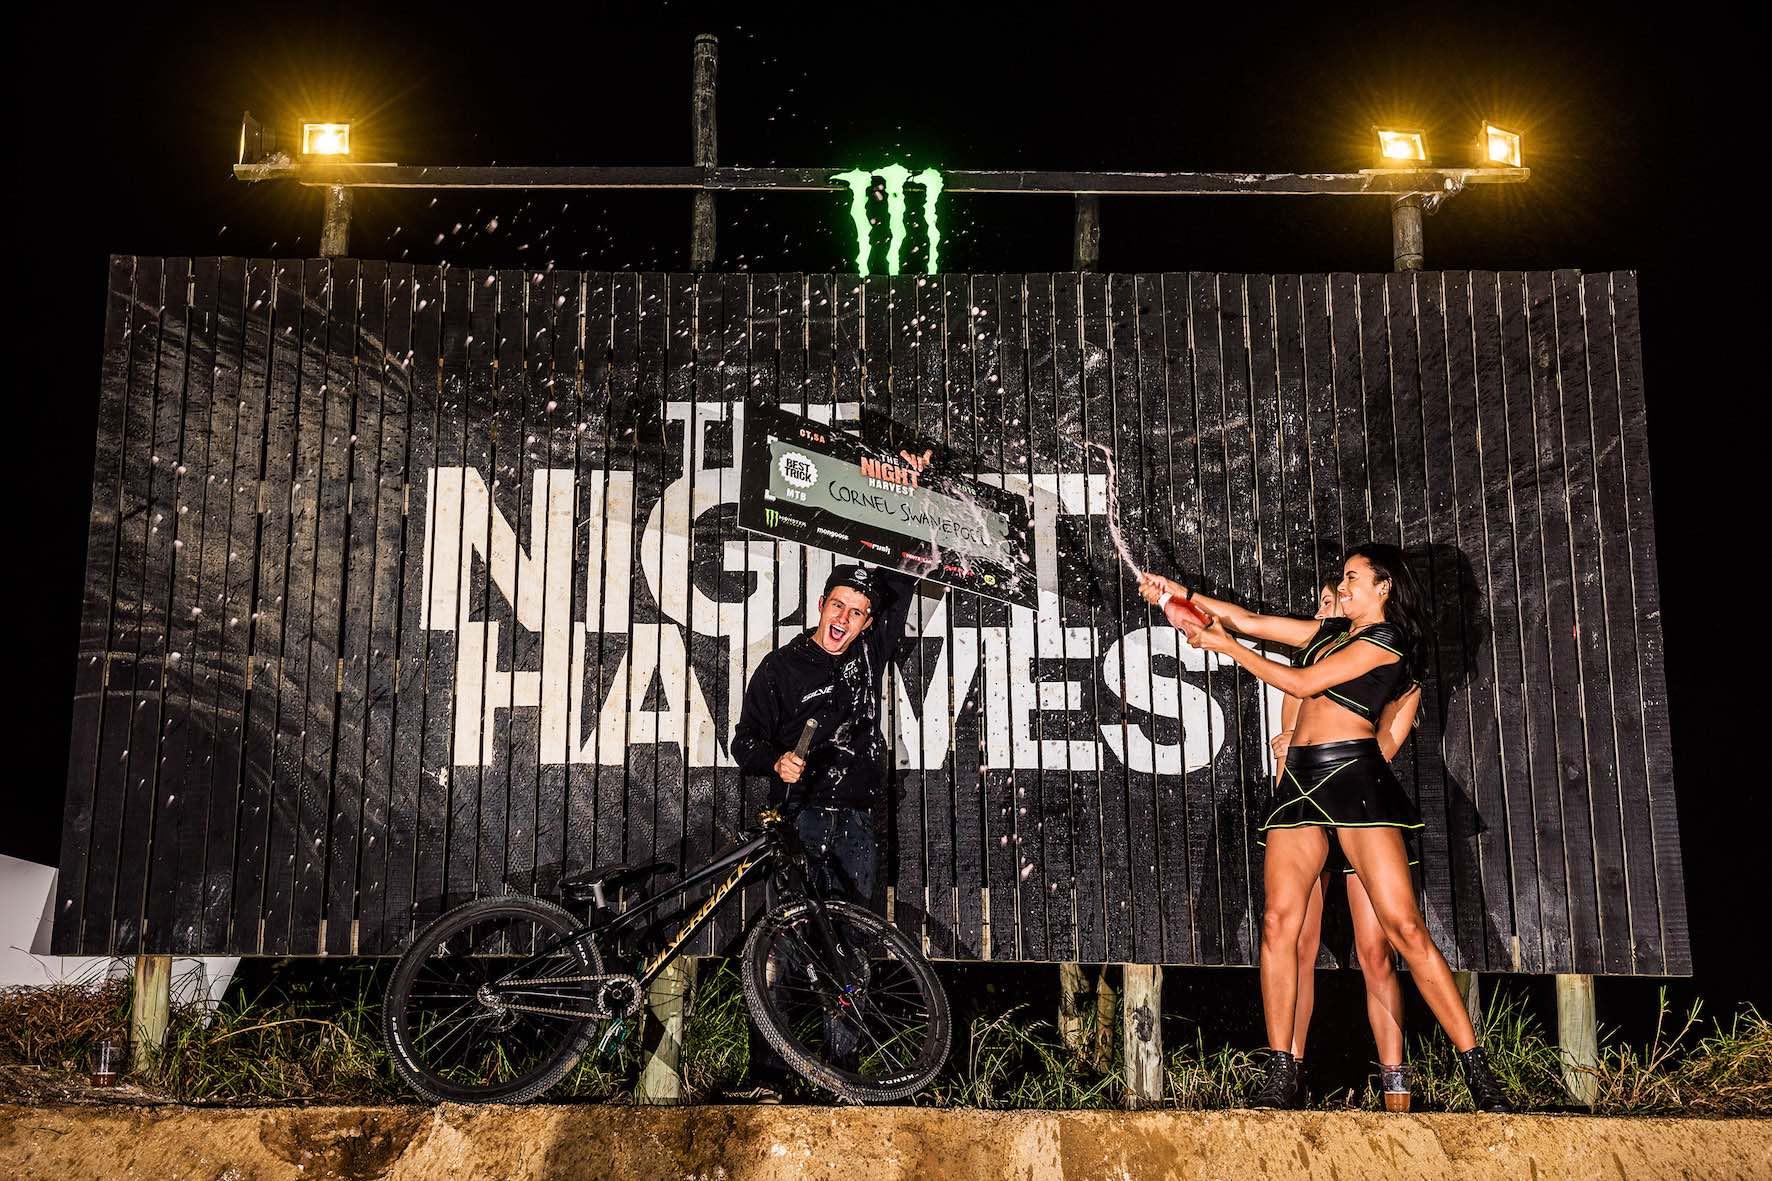 The Night Harvest MTB Best Trick Podium